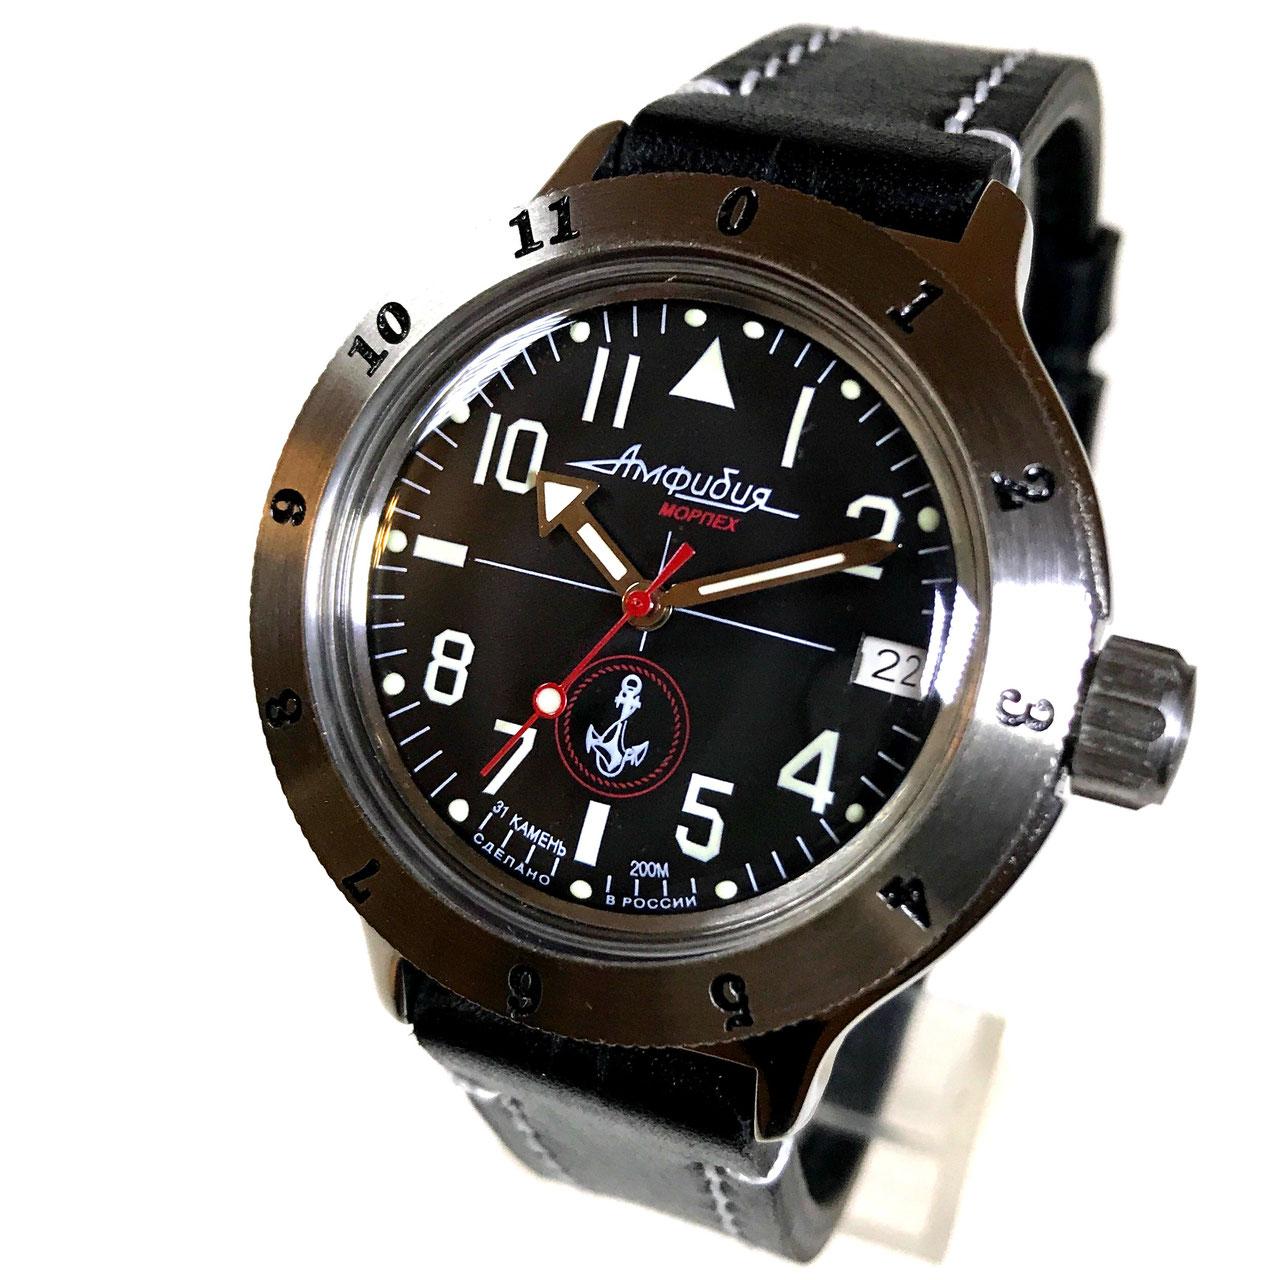 www.vostok-watches24.com